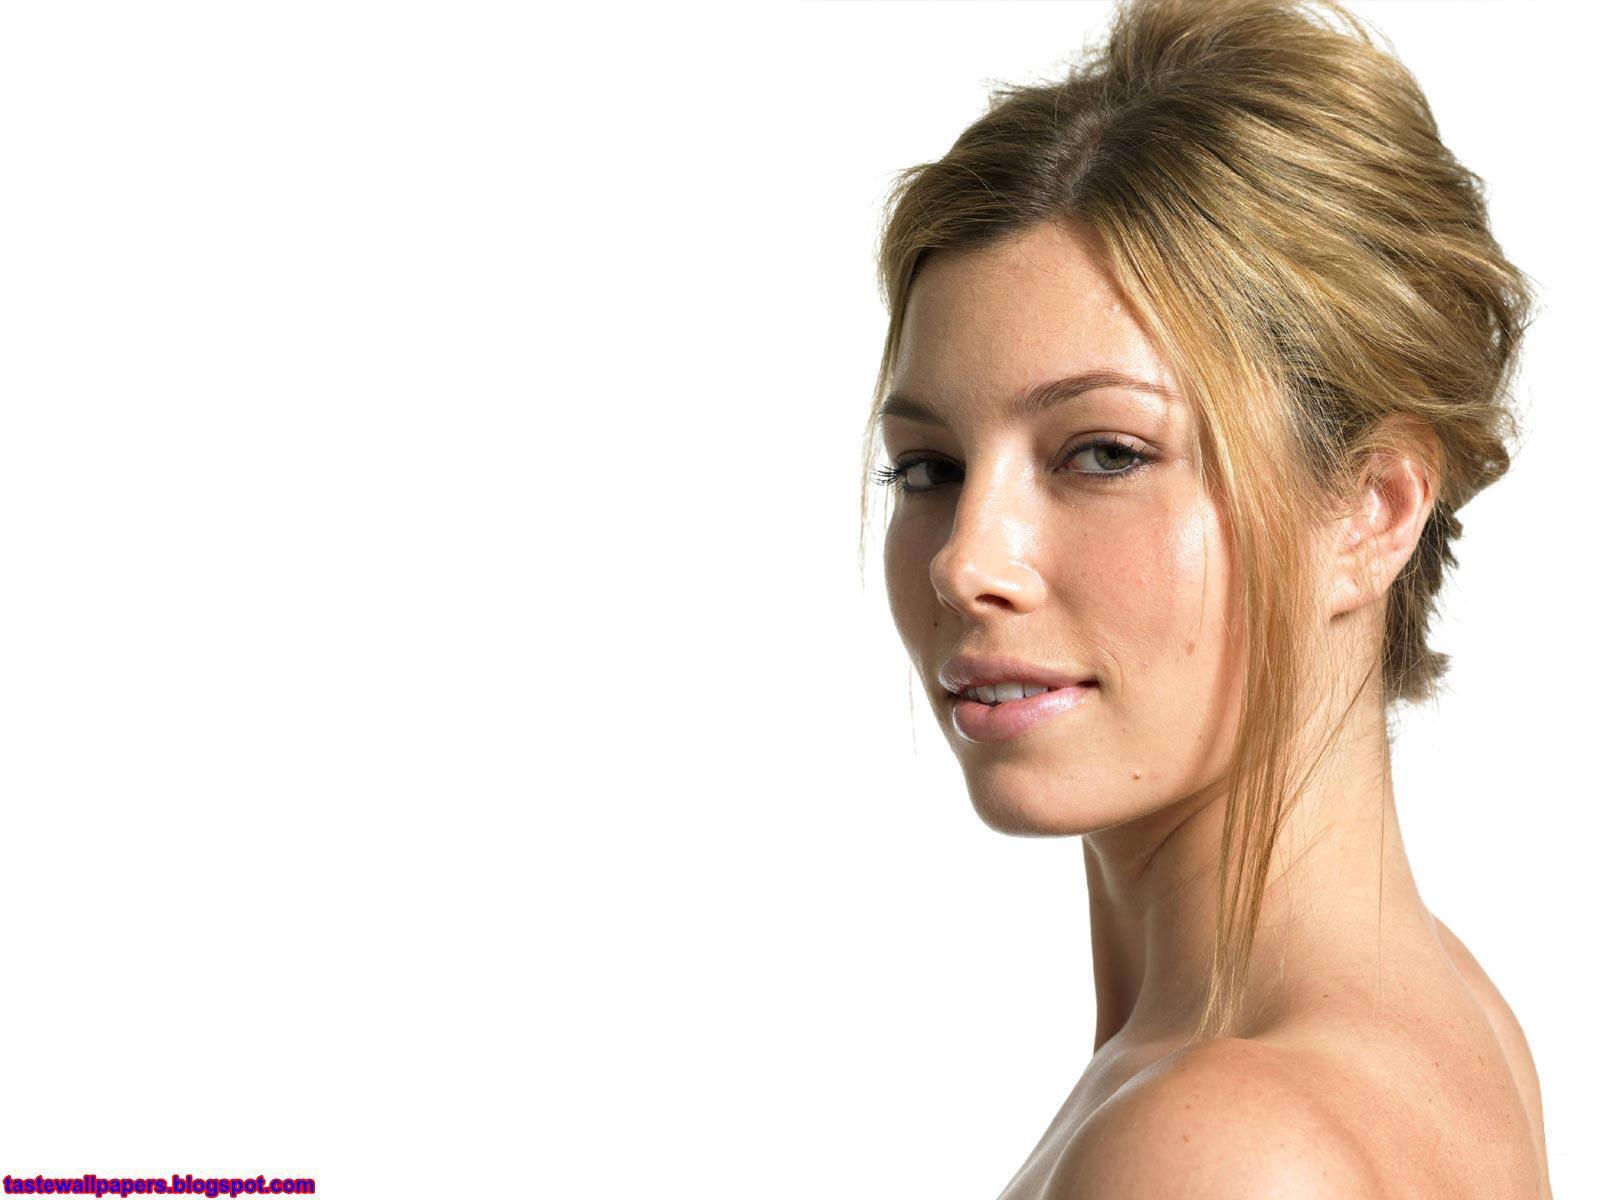 http://3.bp.blogspot.com/-9ICW6cyjvjU/Tq0RYpwFKoI/AAAAAAAAHyE/tAlB6ofxD-k/s1600/Jessica_Biel_hq_wallpapers_hair_style.jpg